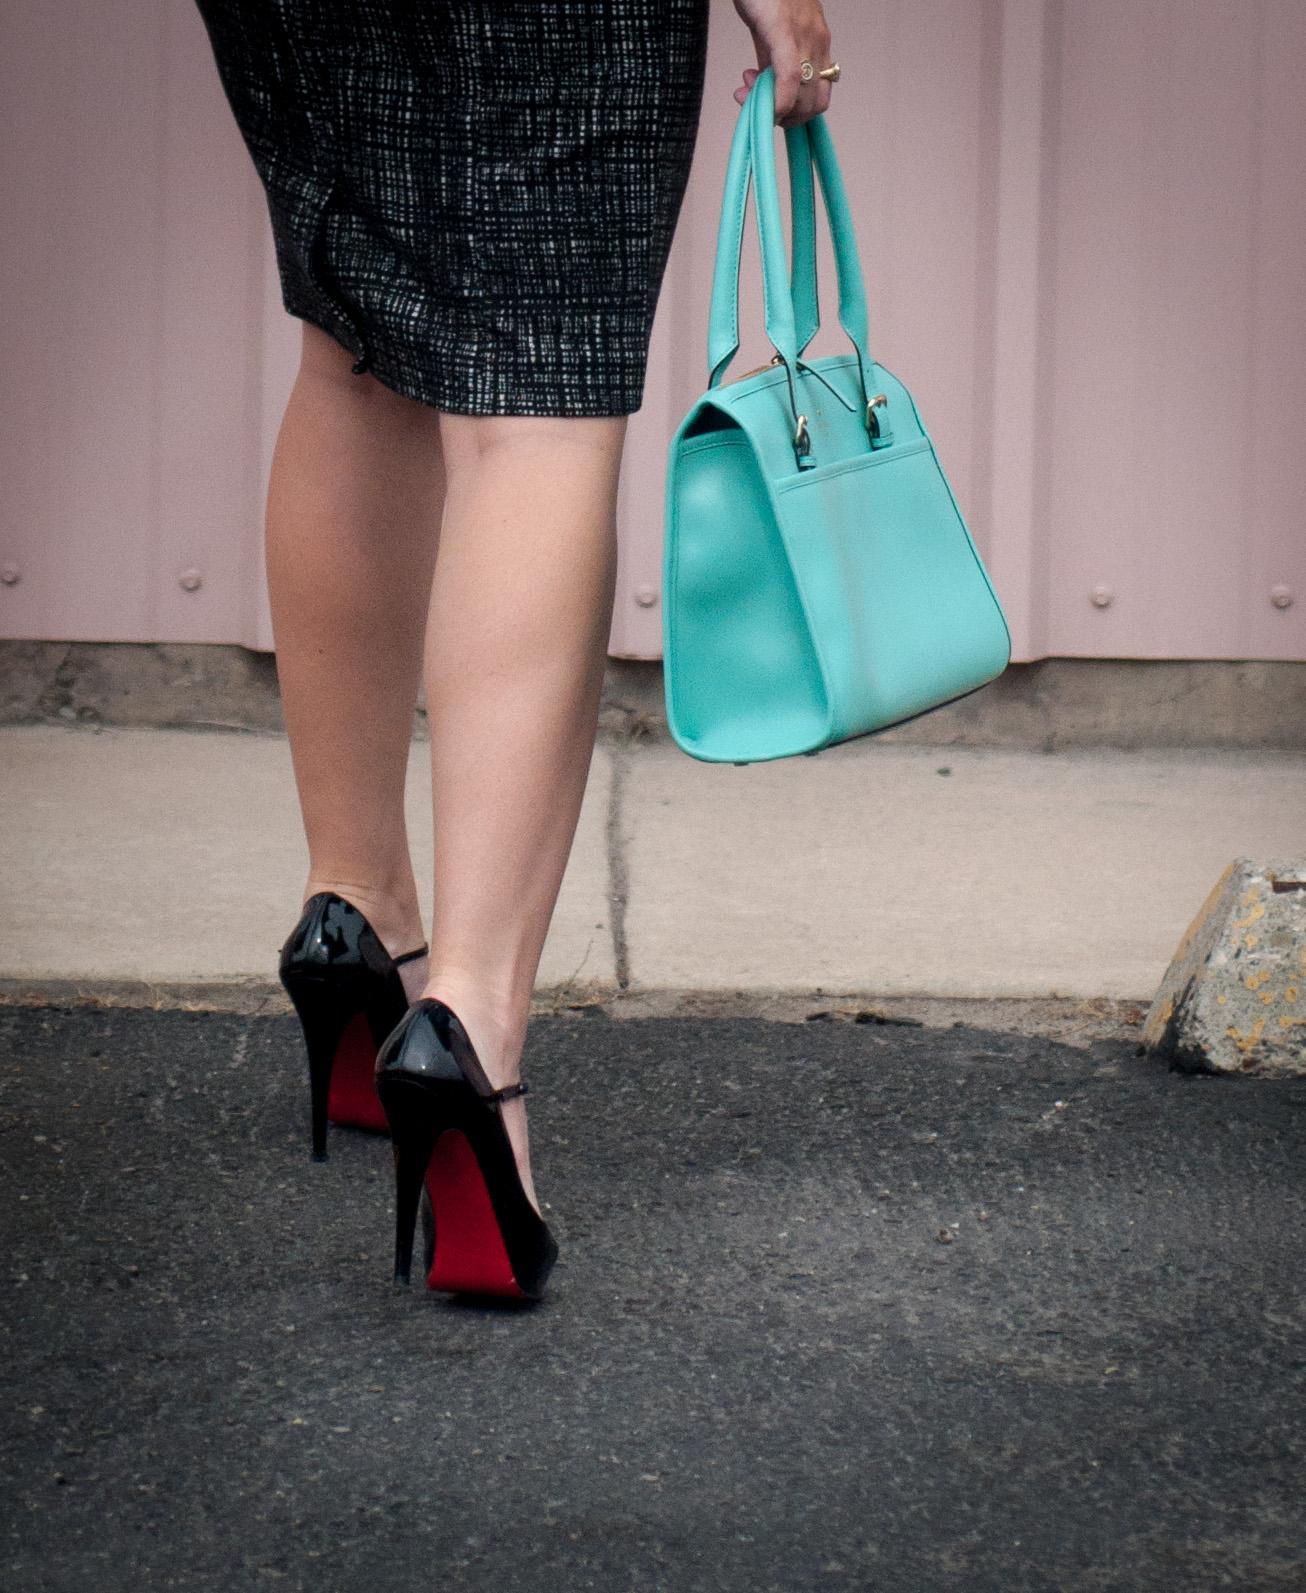 red soles, christian louboutin, kate spade, kate spade new york hand bag, black heels, ootd